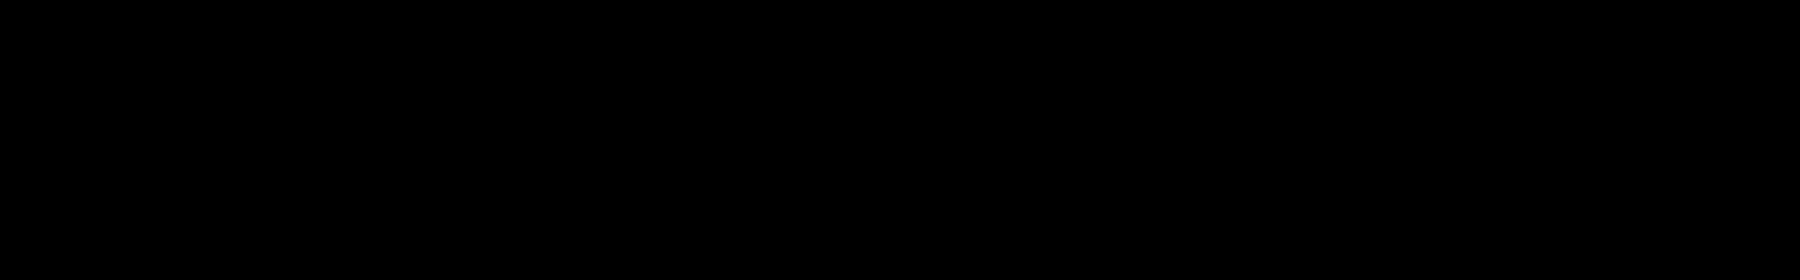 Tecla audio waveform